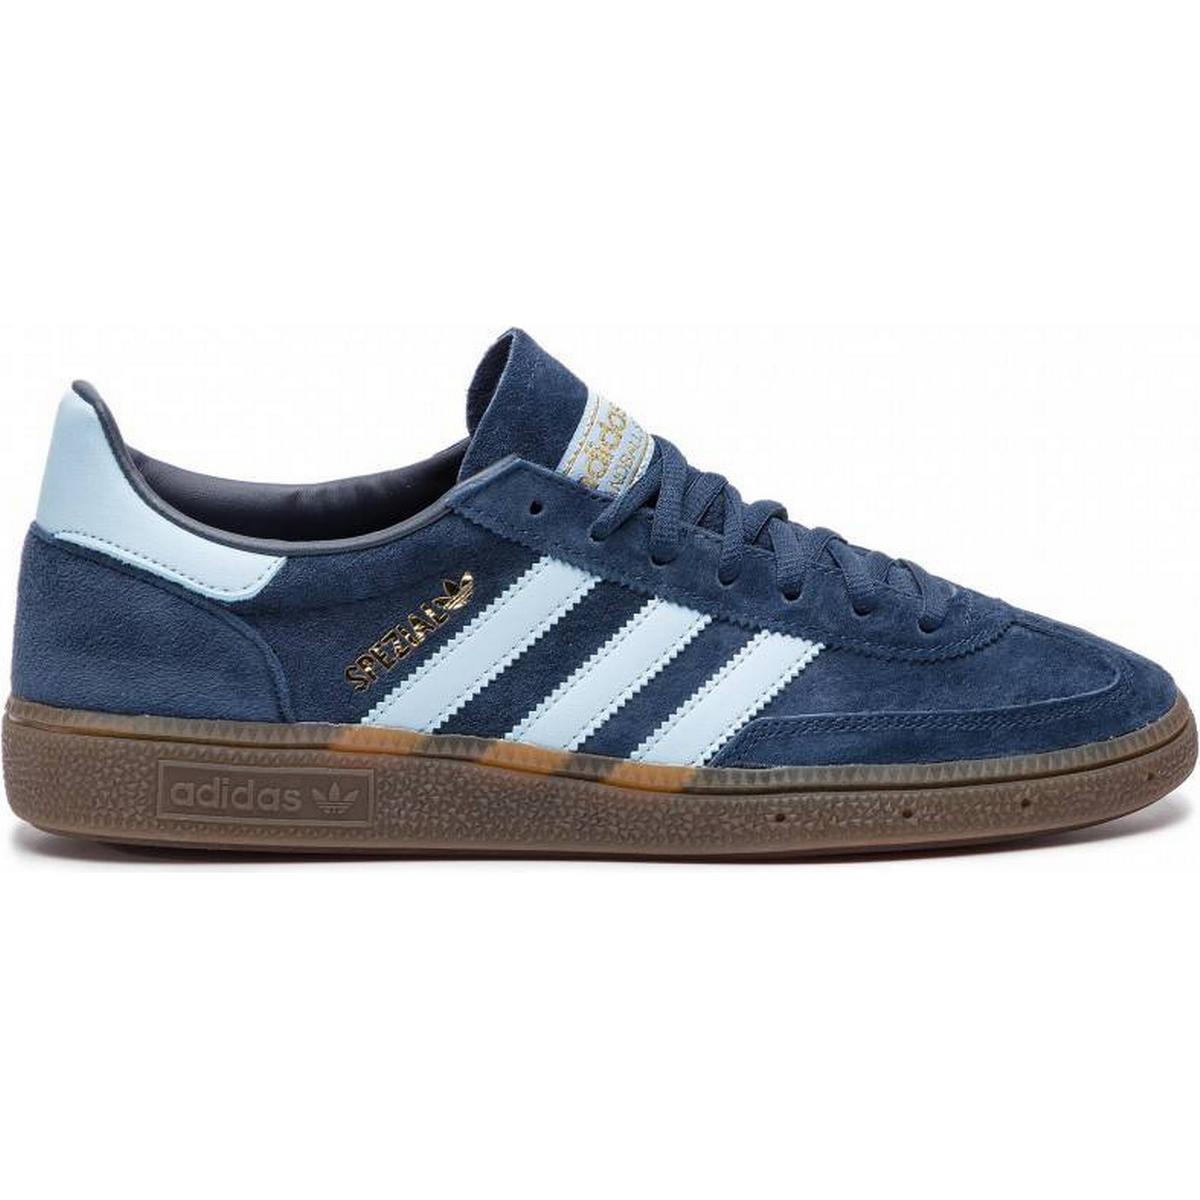 Adidas Spezial Skor (1000+ produkter) hos PriceRunner • Se